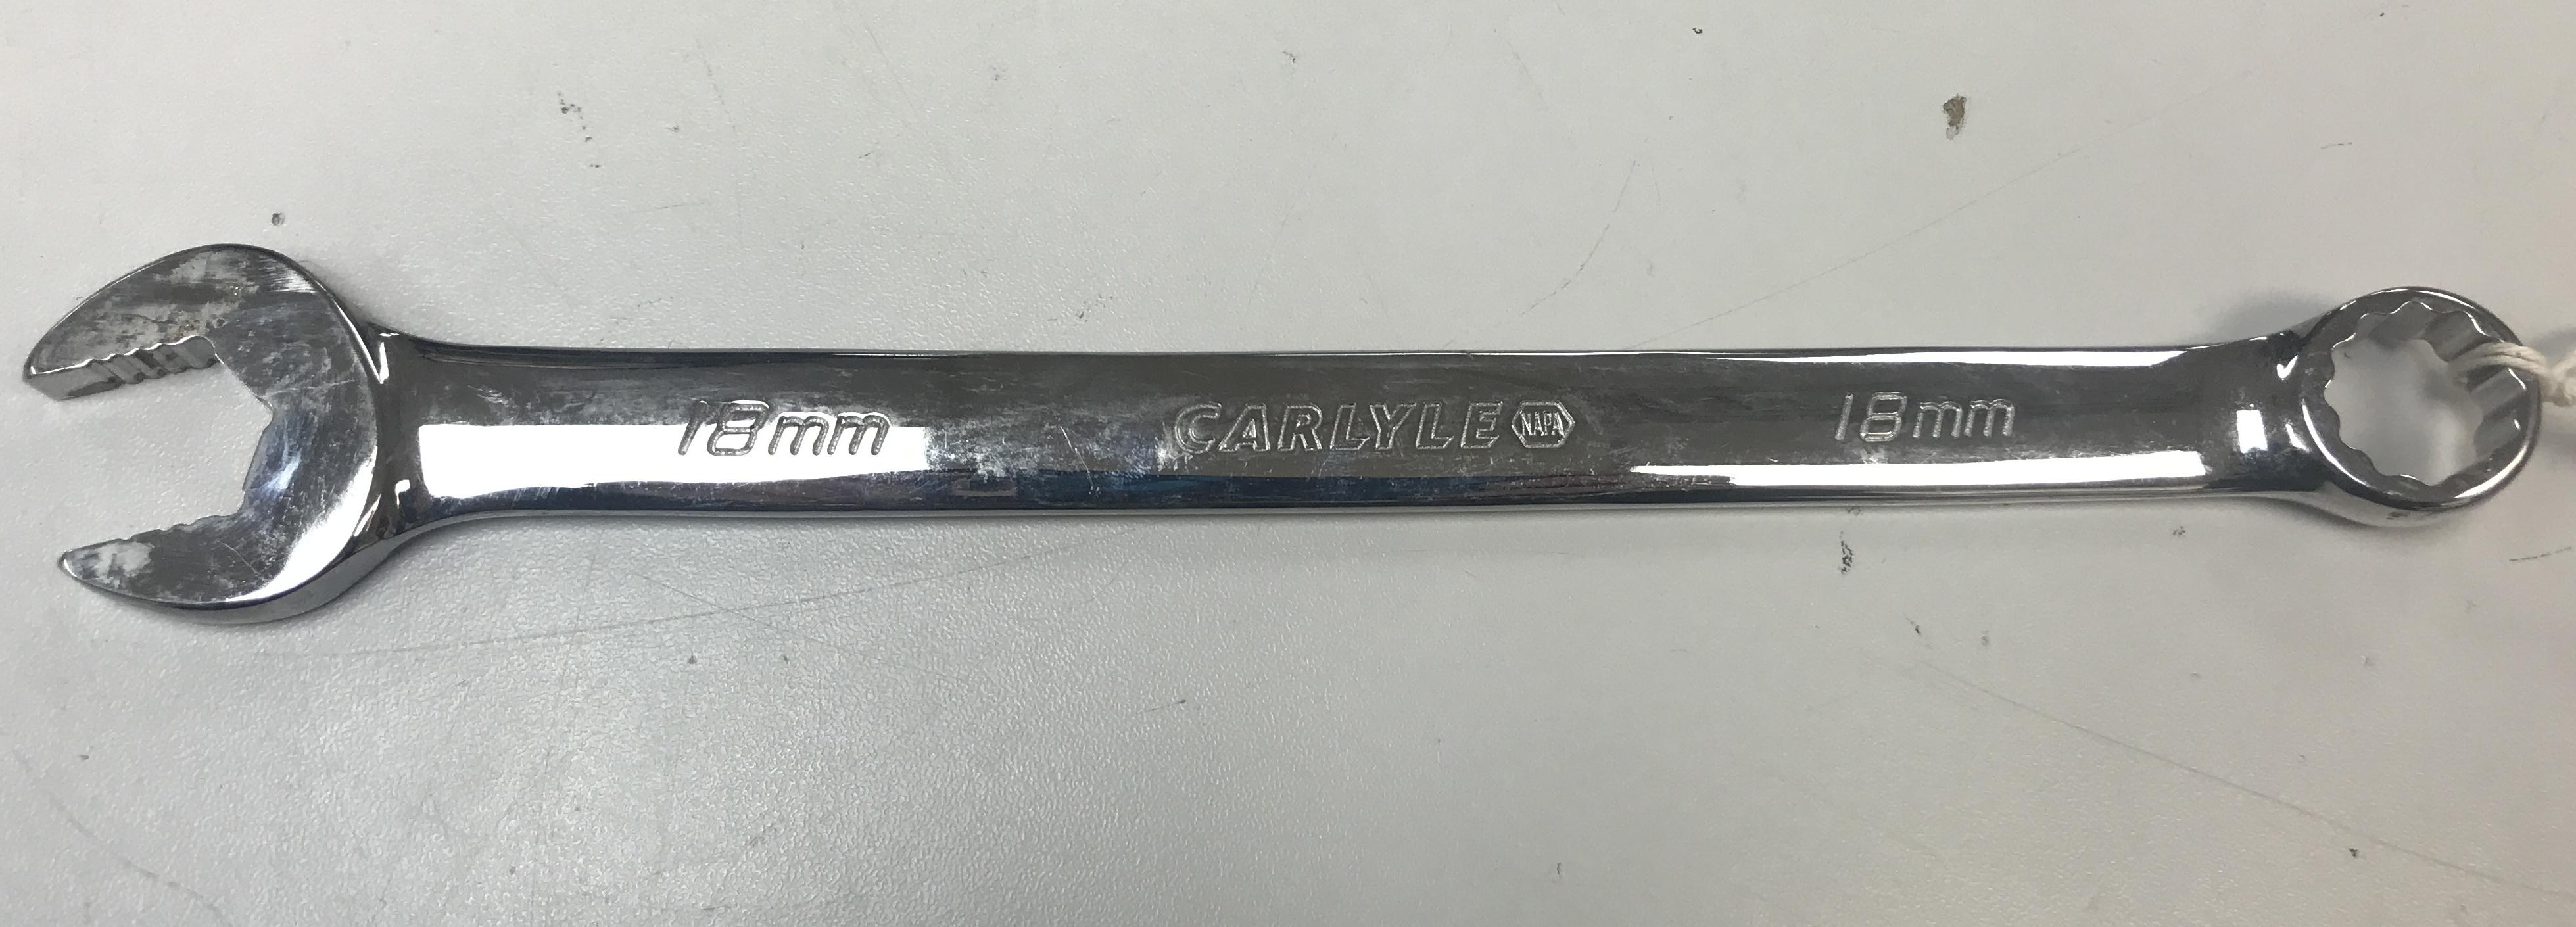 NAPA Carlyle  CWLNS118M  18mm